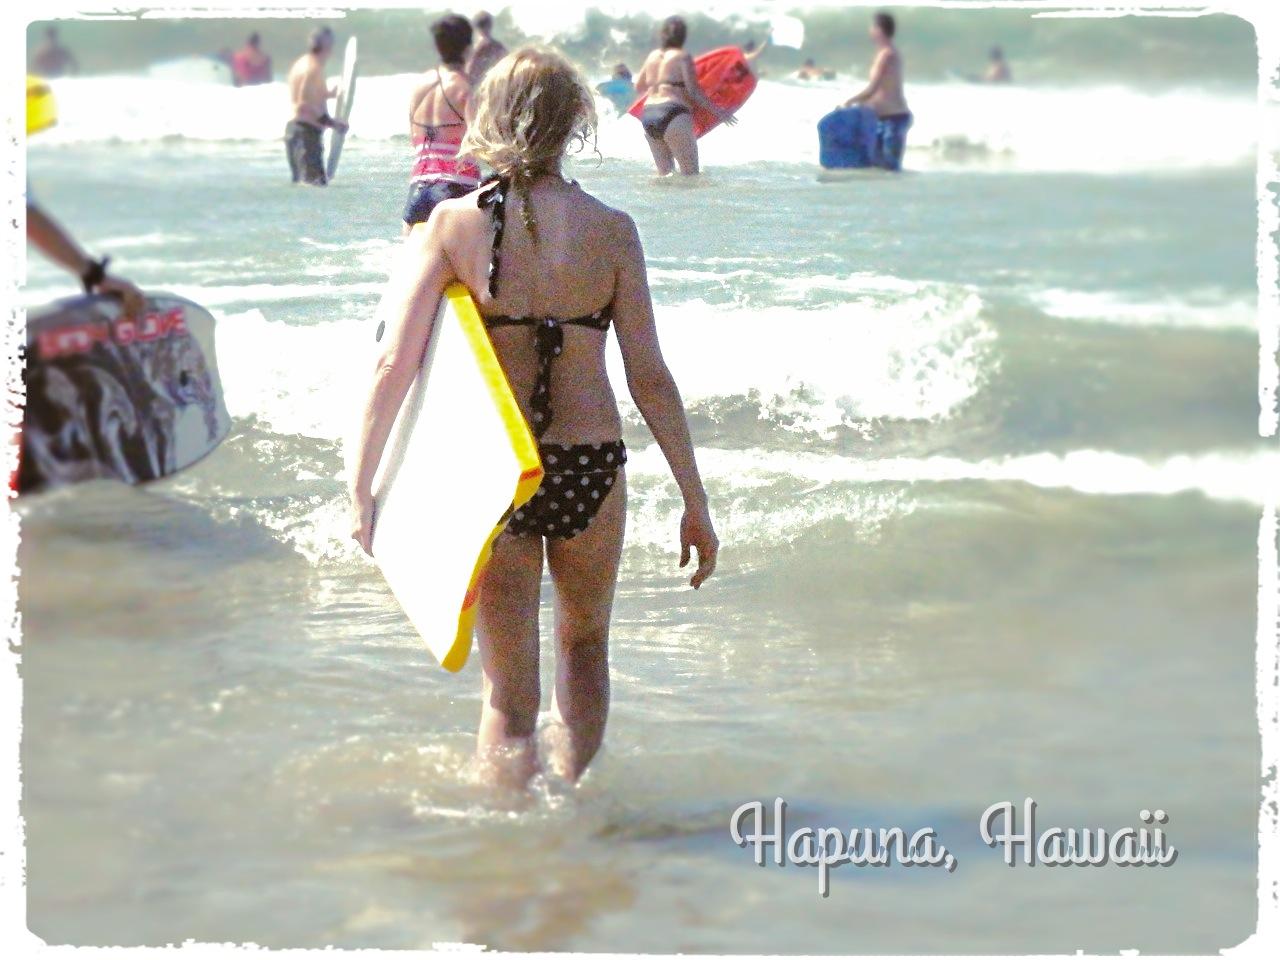 Hapuna Boogie Boarding!